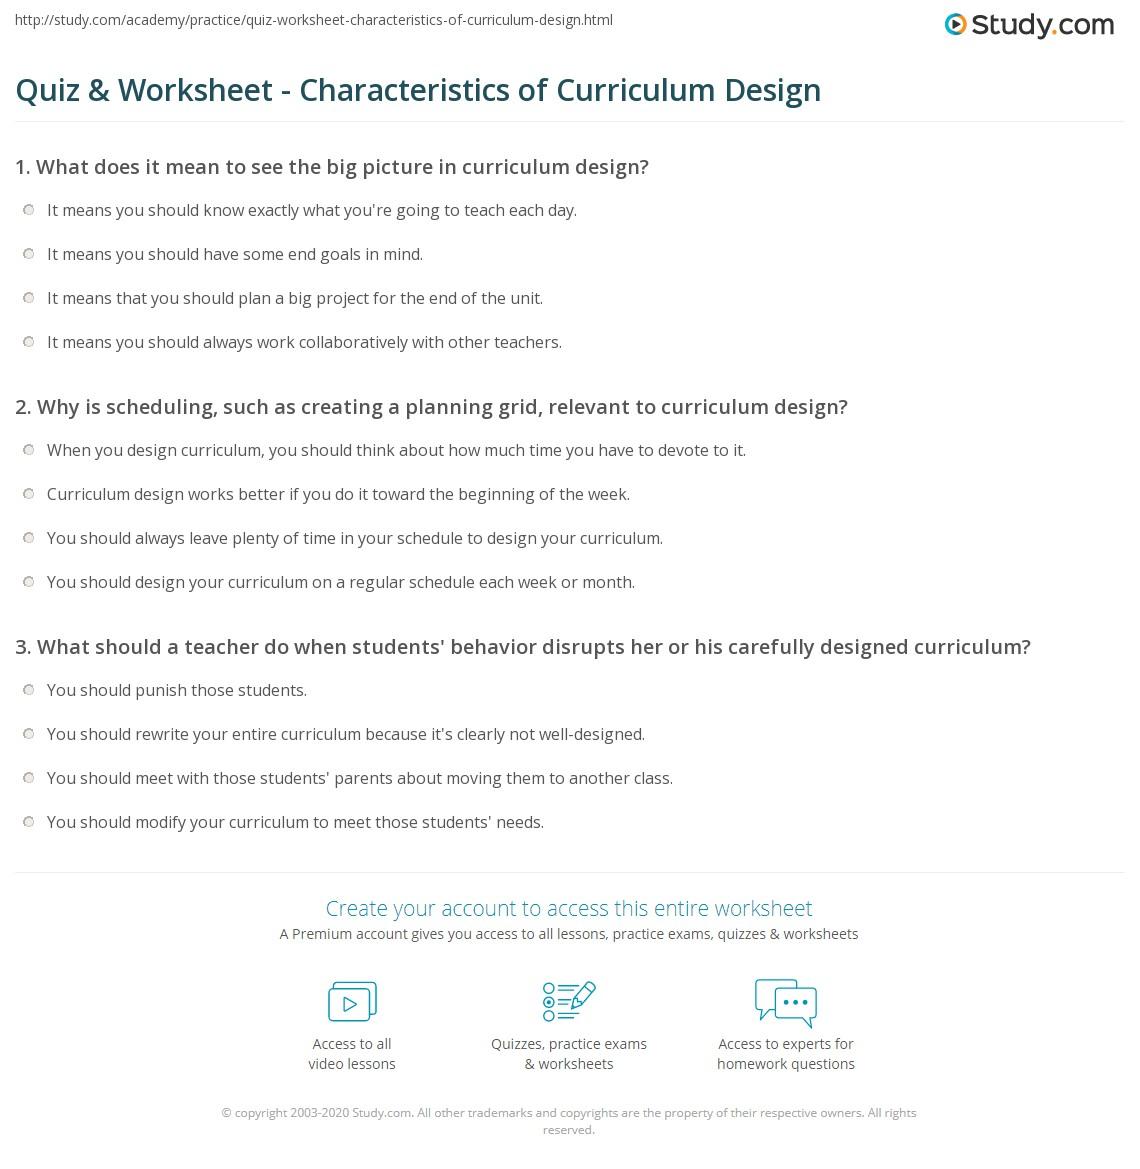 quiz worksheet characteristics of curriculum design. Black Bedroom Furniture Sets. Home Design Ideas